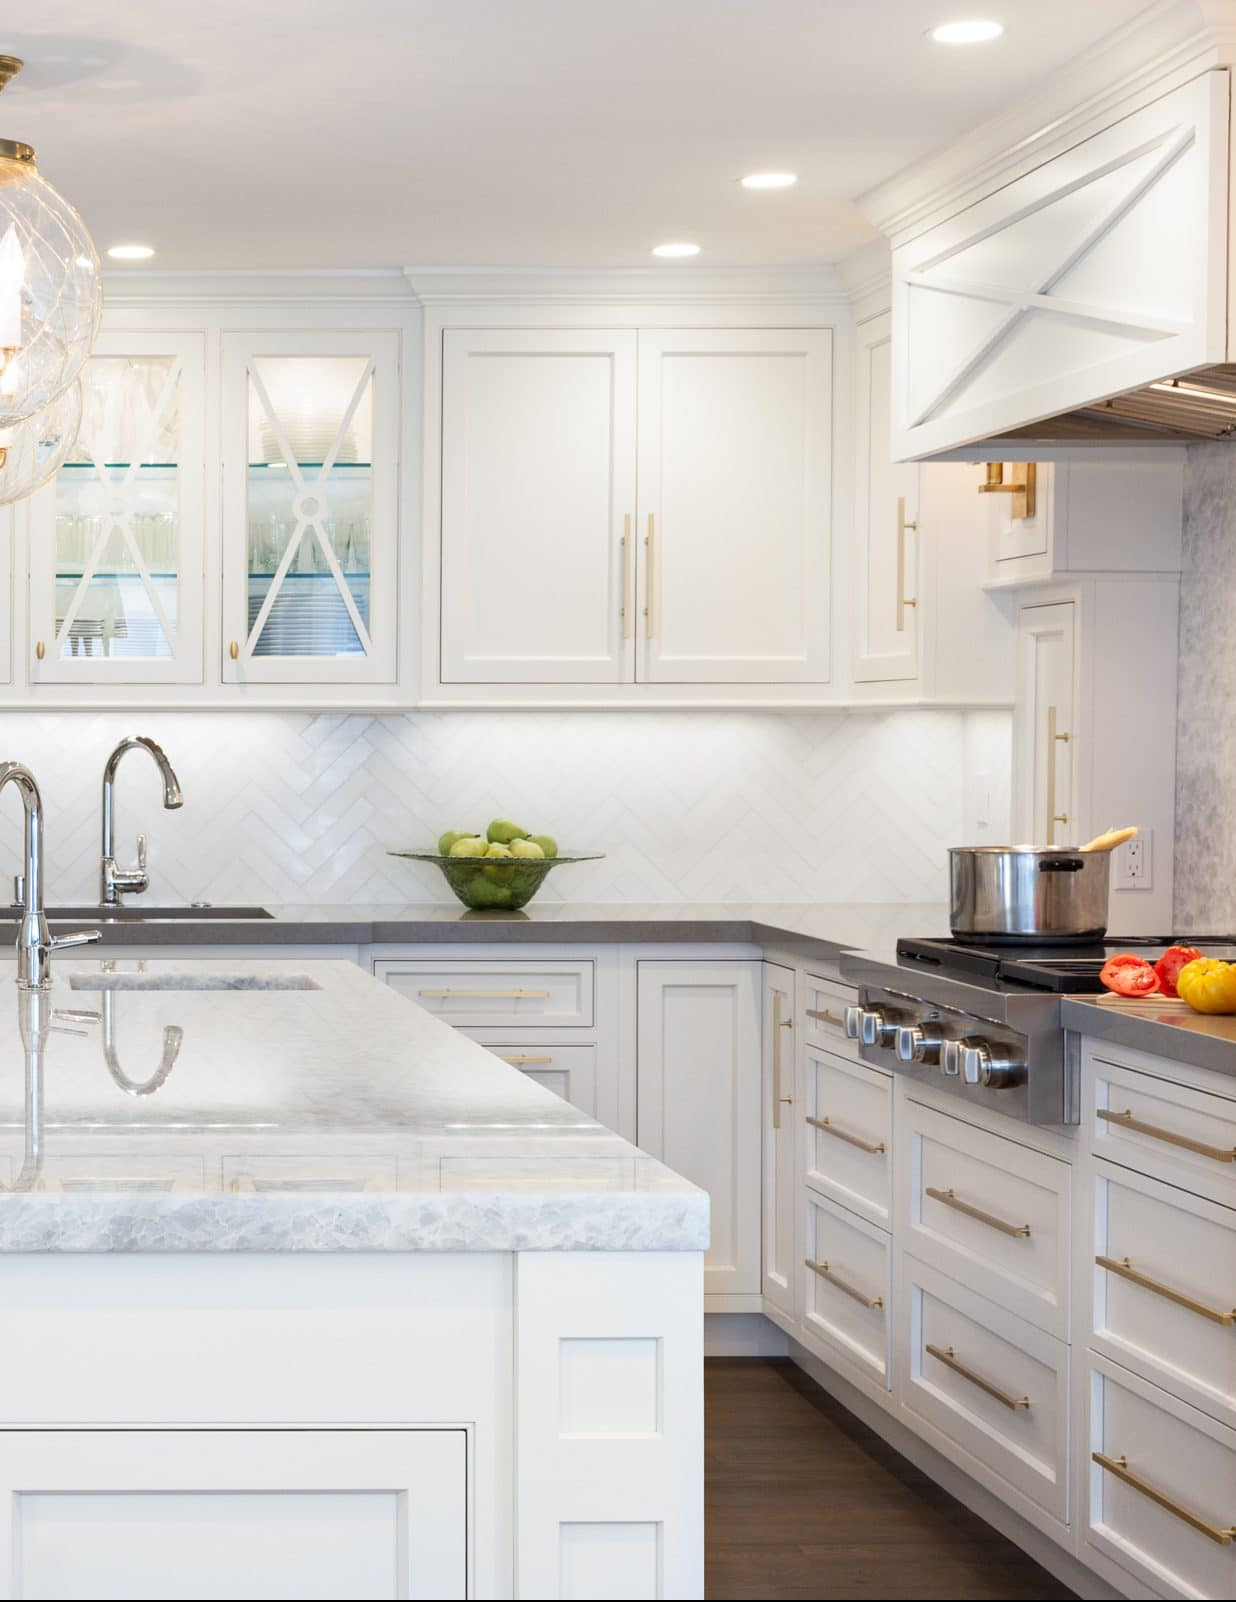 5 Pro Kitchen Lighting Tips 3 Recessed Led Lighting